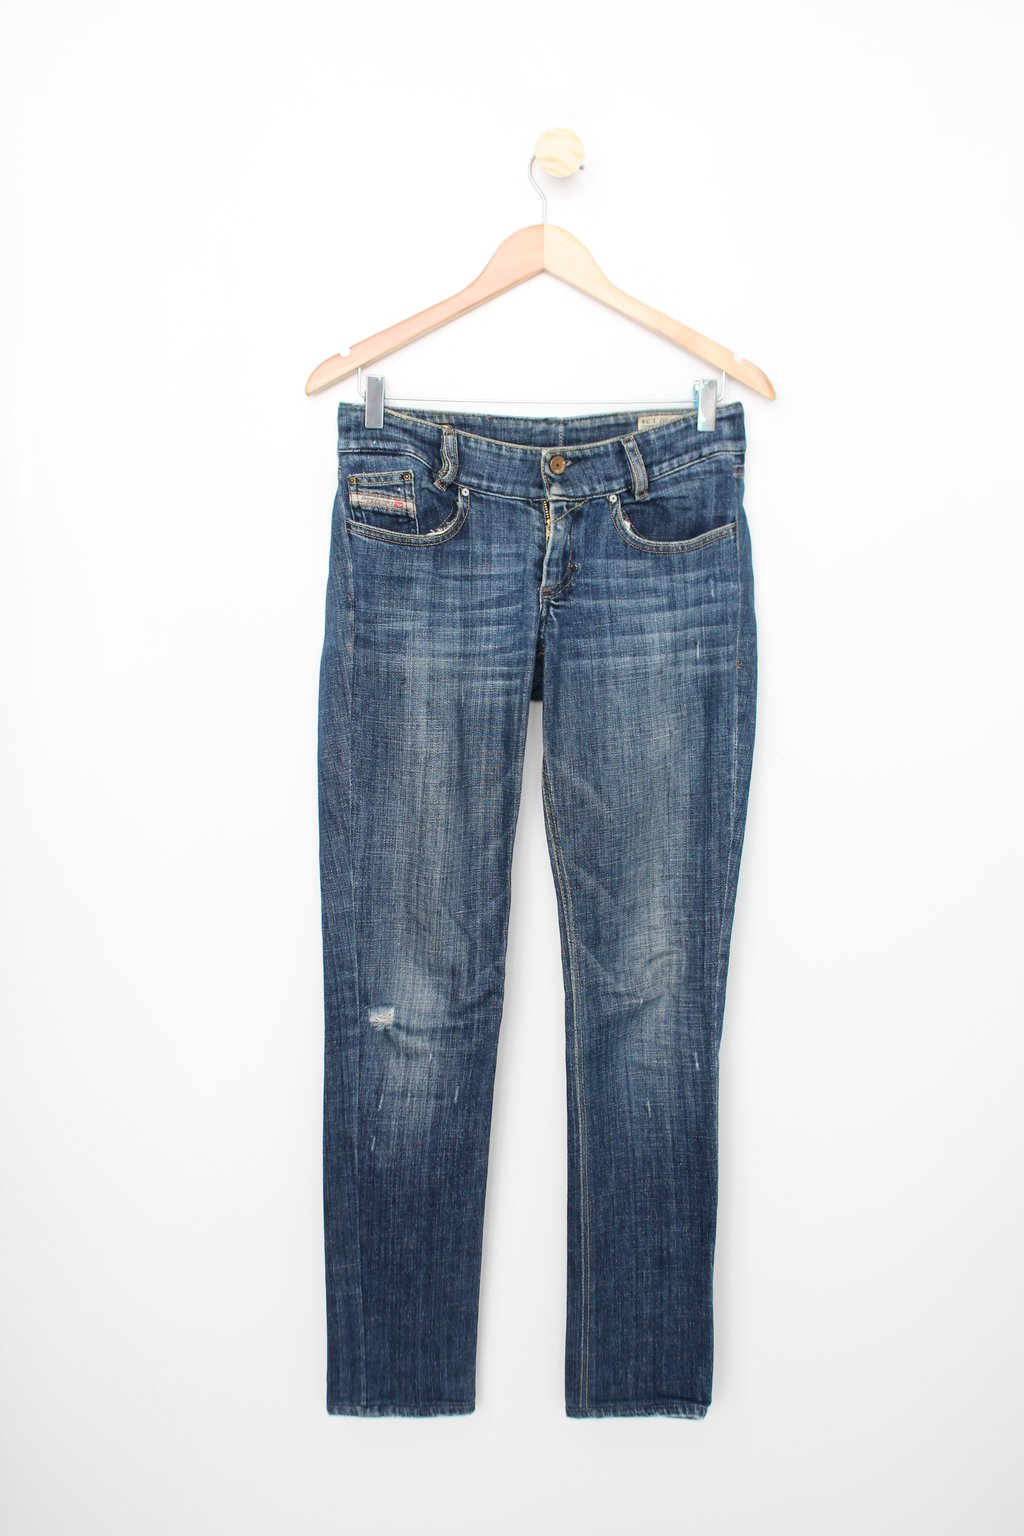 Calça Jeans Diesel Feminina Azul